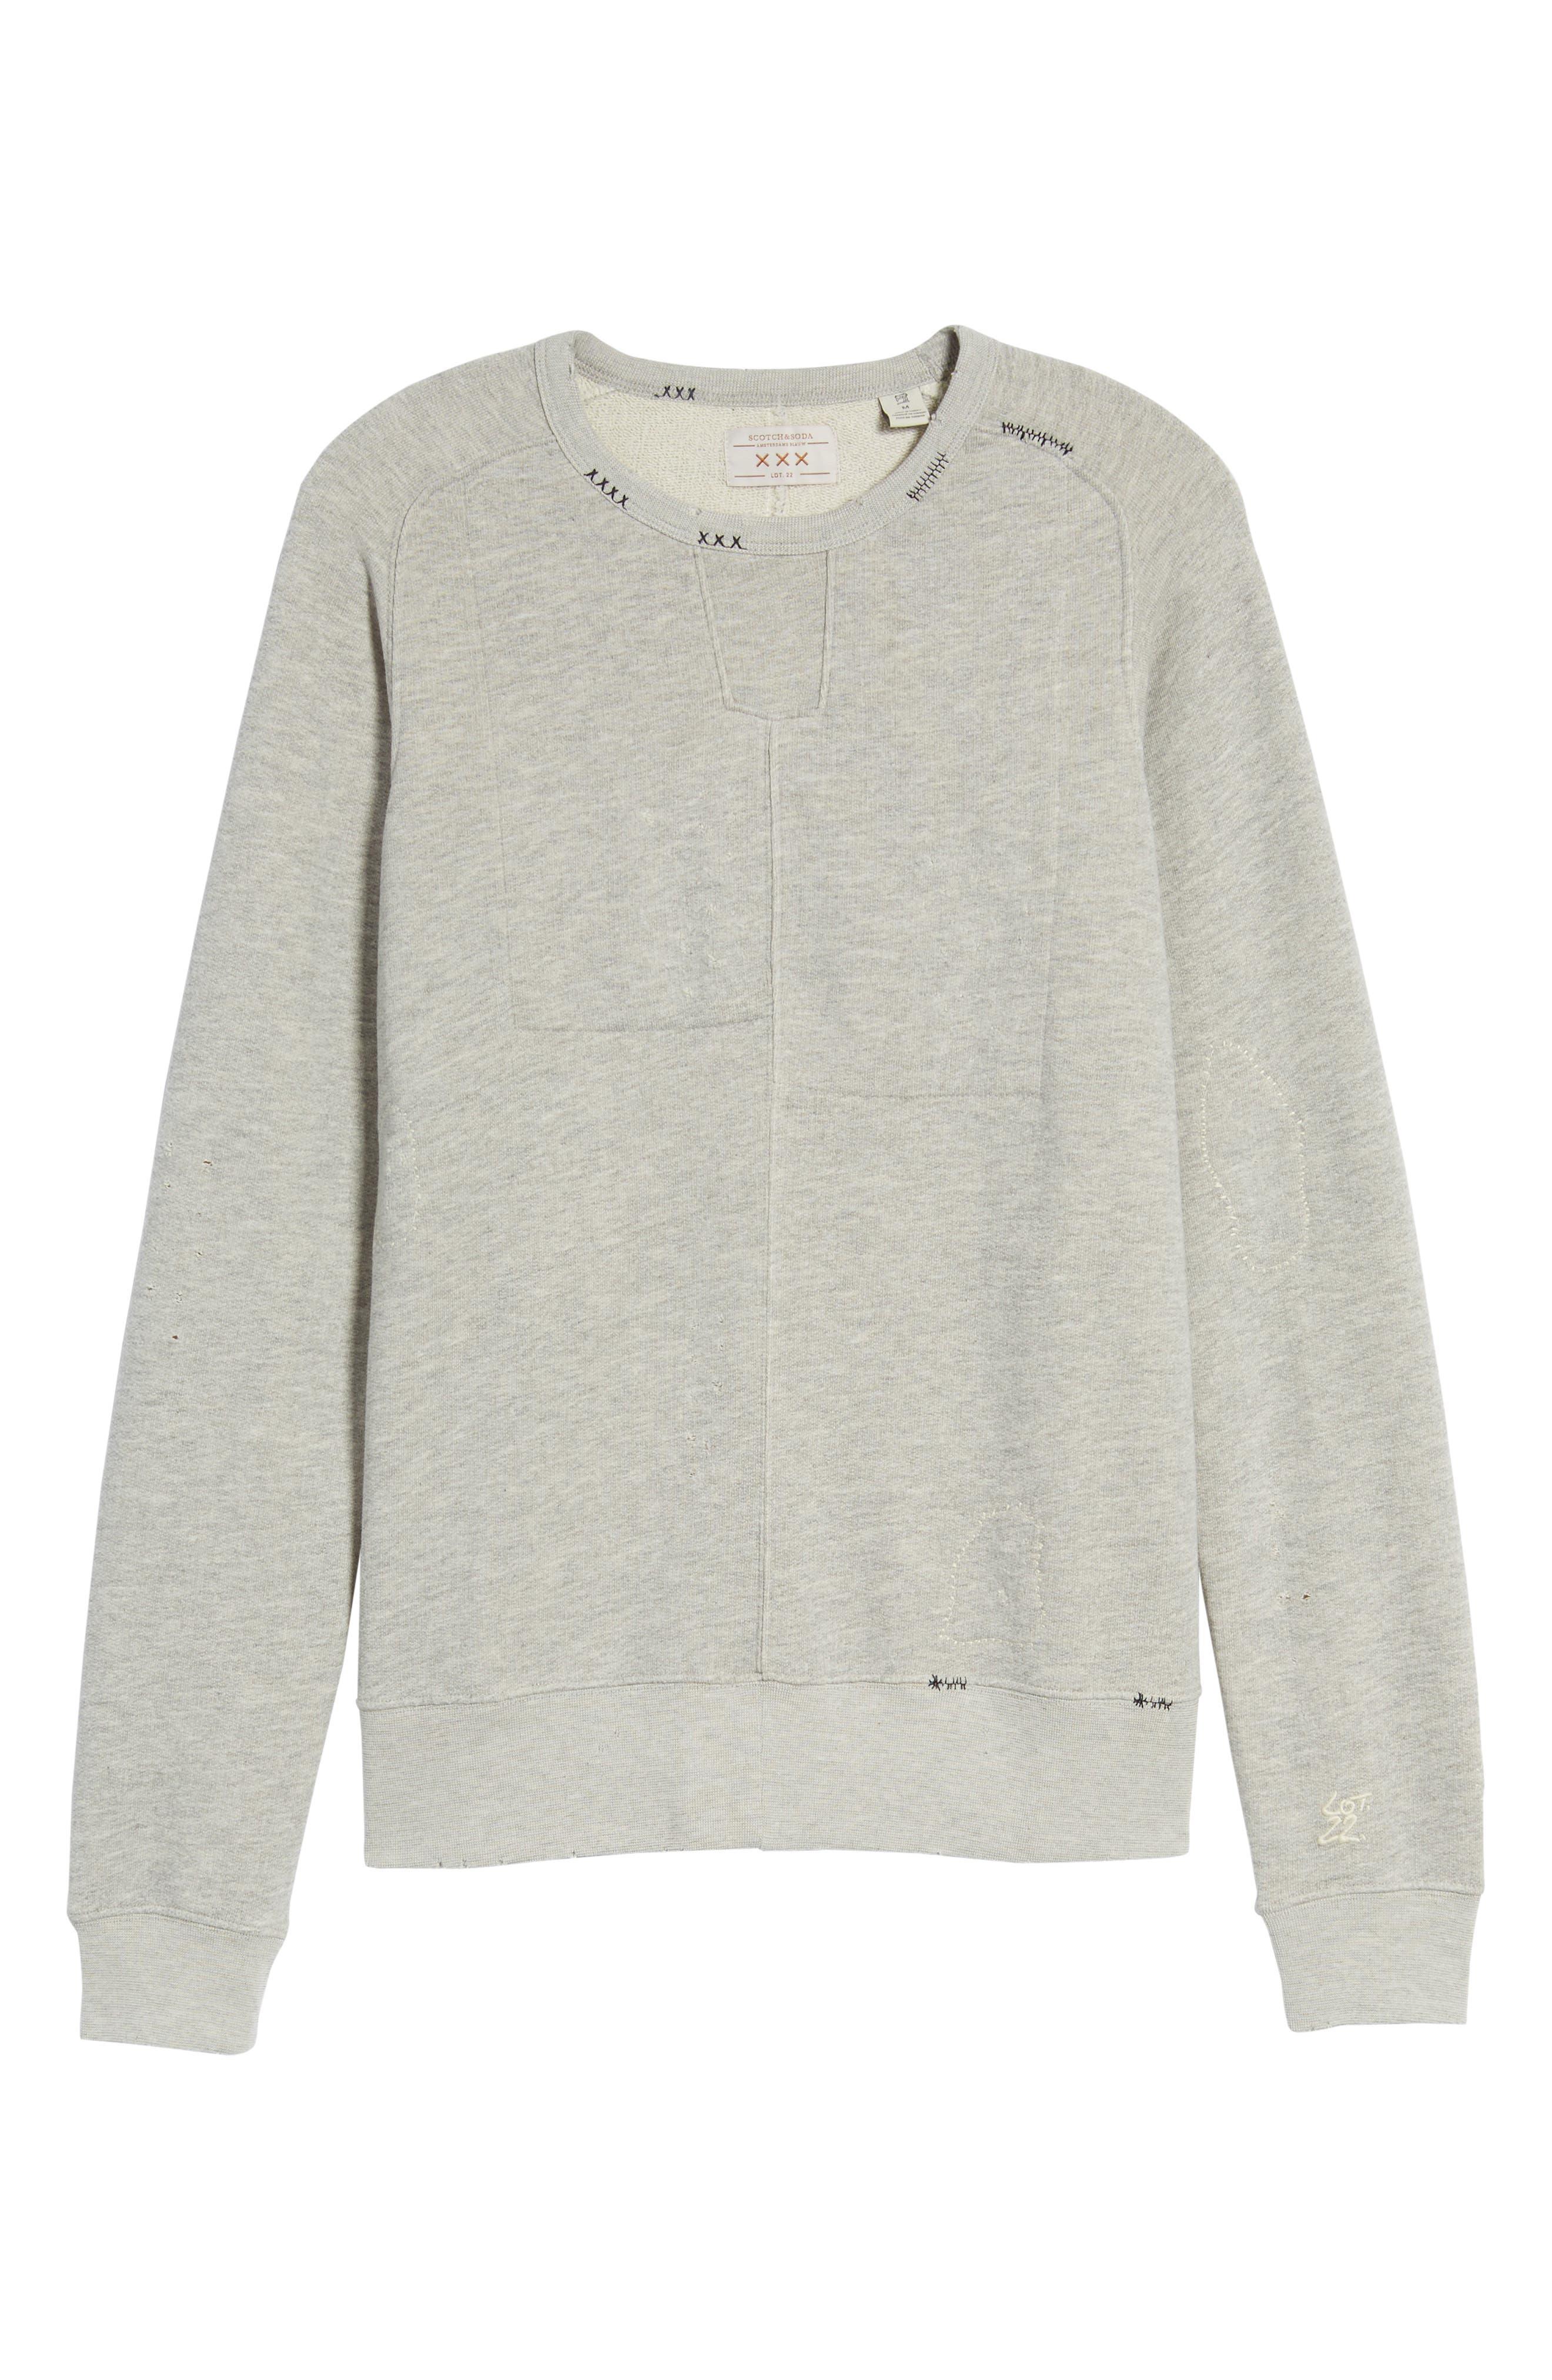 Lot 22 Sweatshirt,                             Alternate thumbnail 6, color,                             450